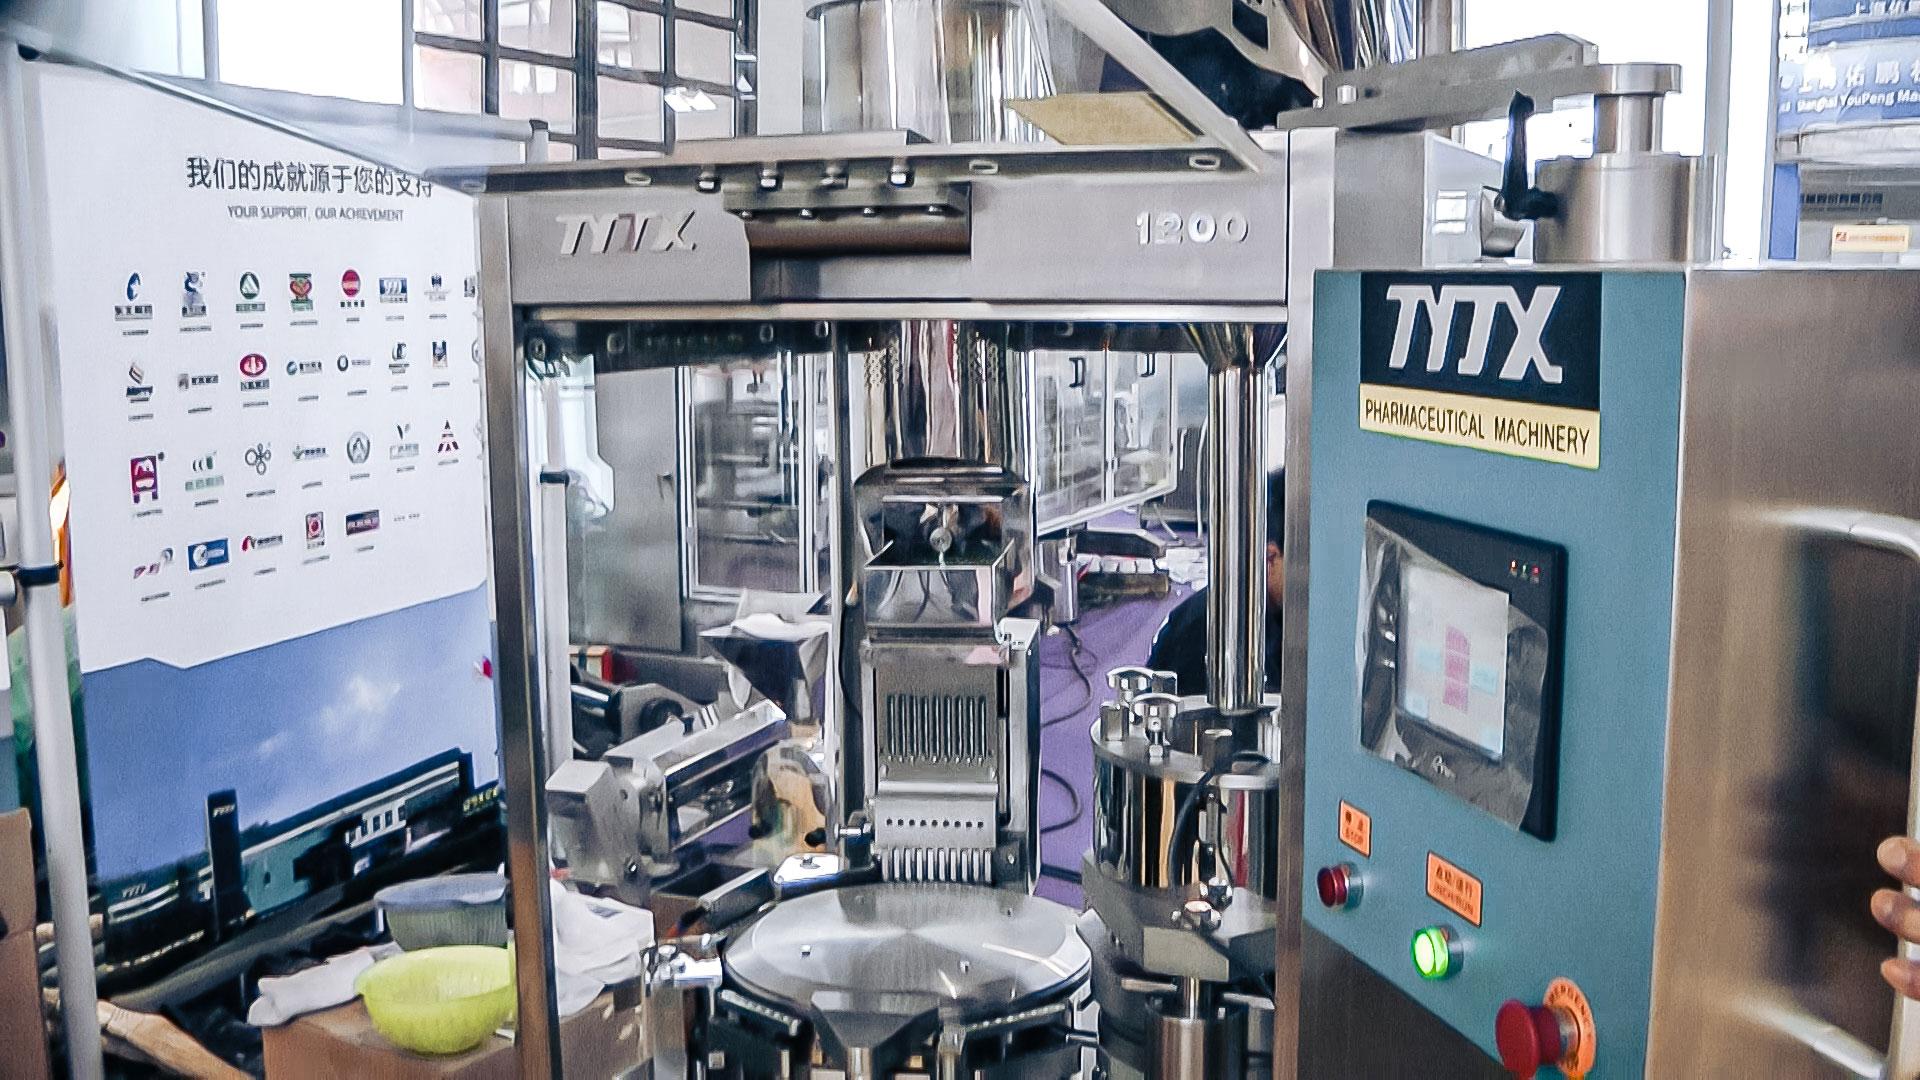 Automatic capsule machine for hard gelatin capsules in pharmaceutical production